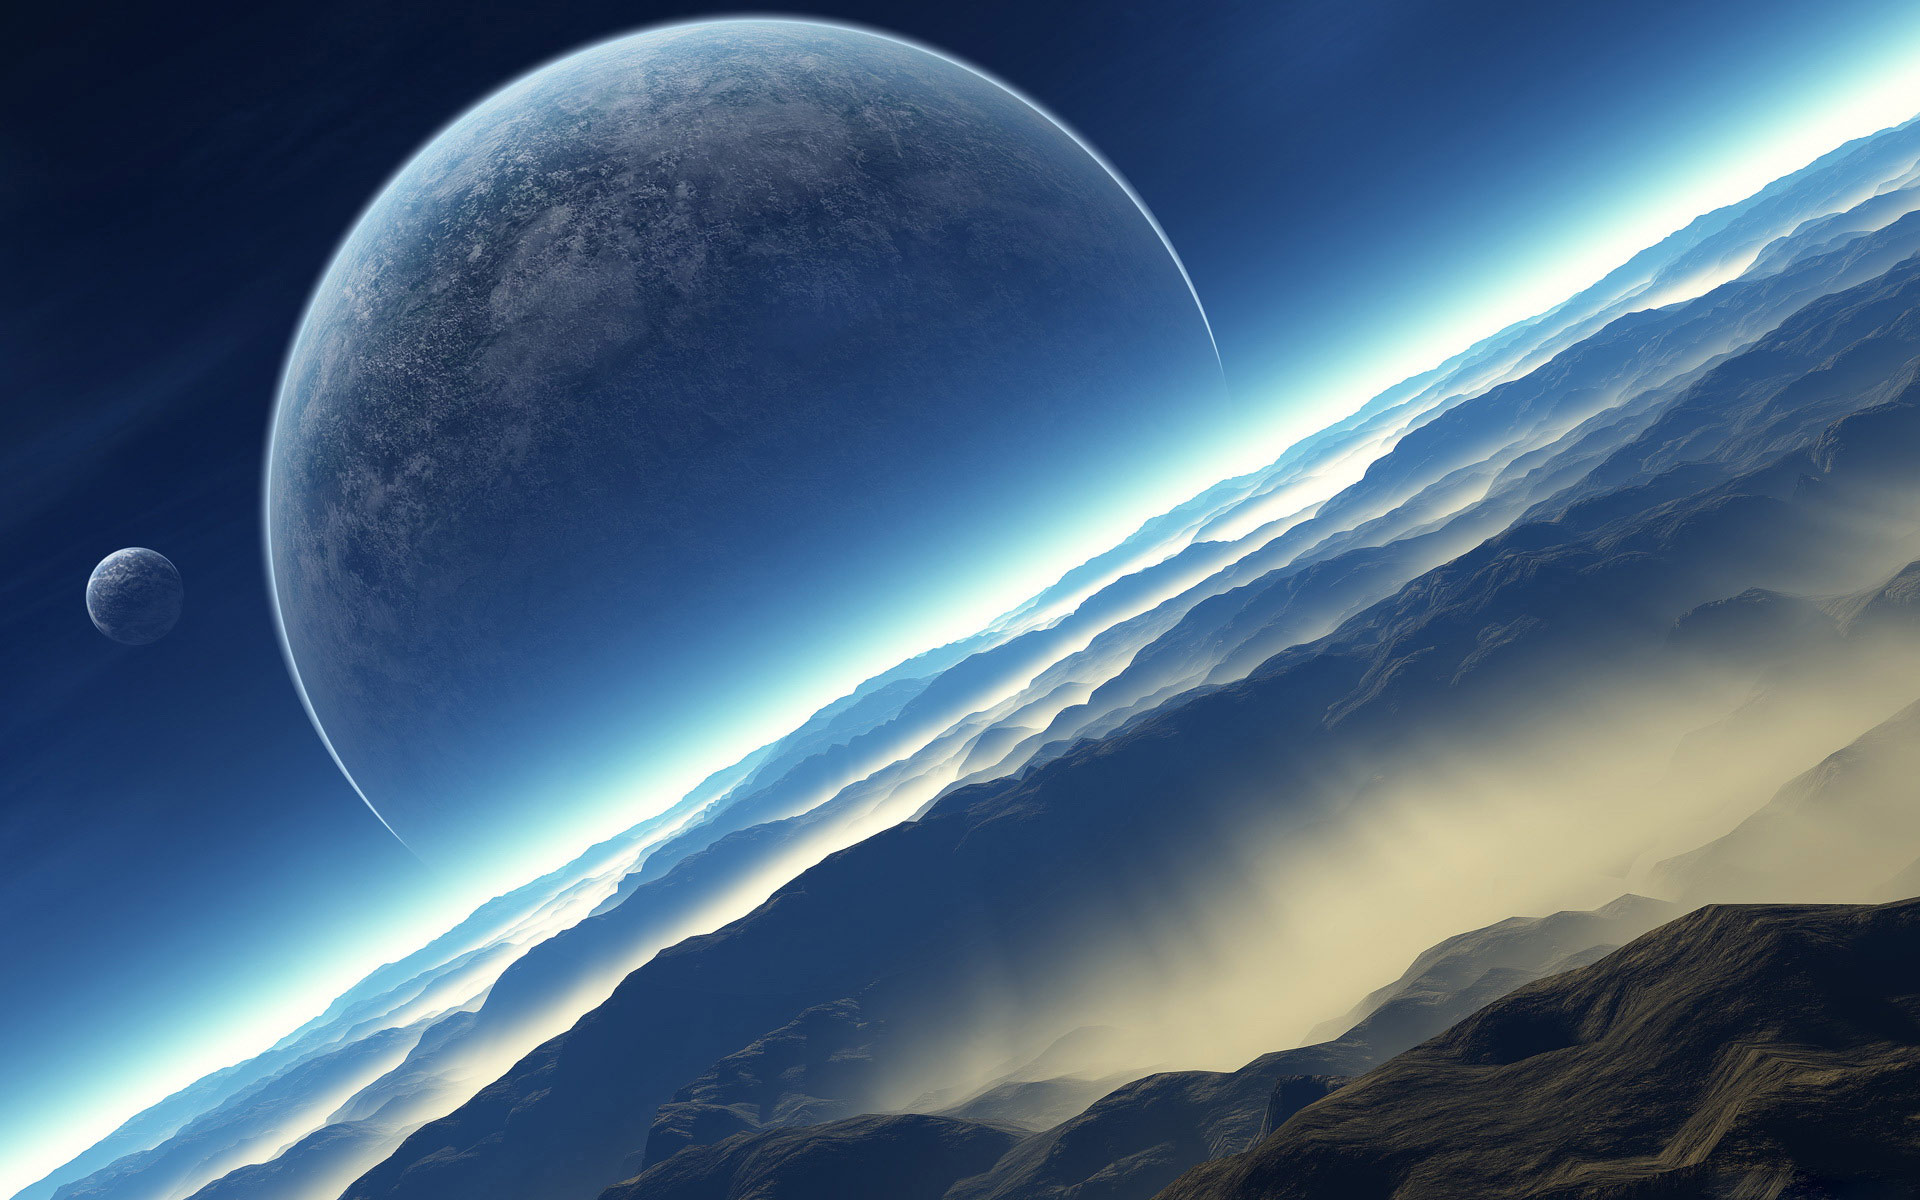 Solar Eclipse Wallpaper Free Downloads